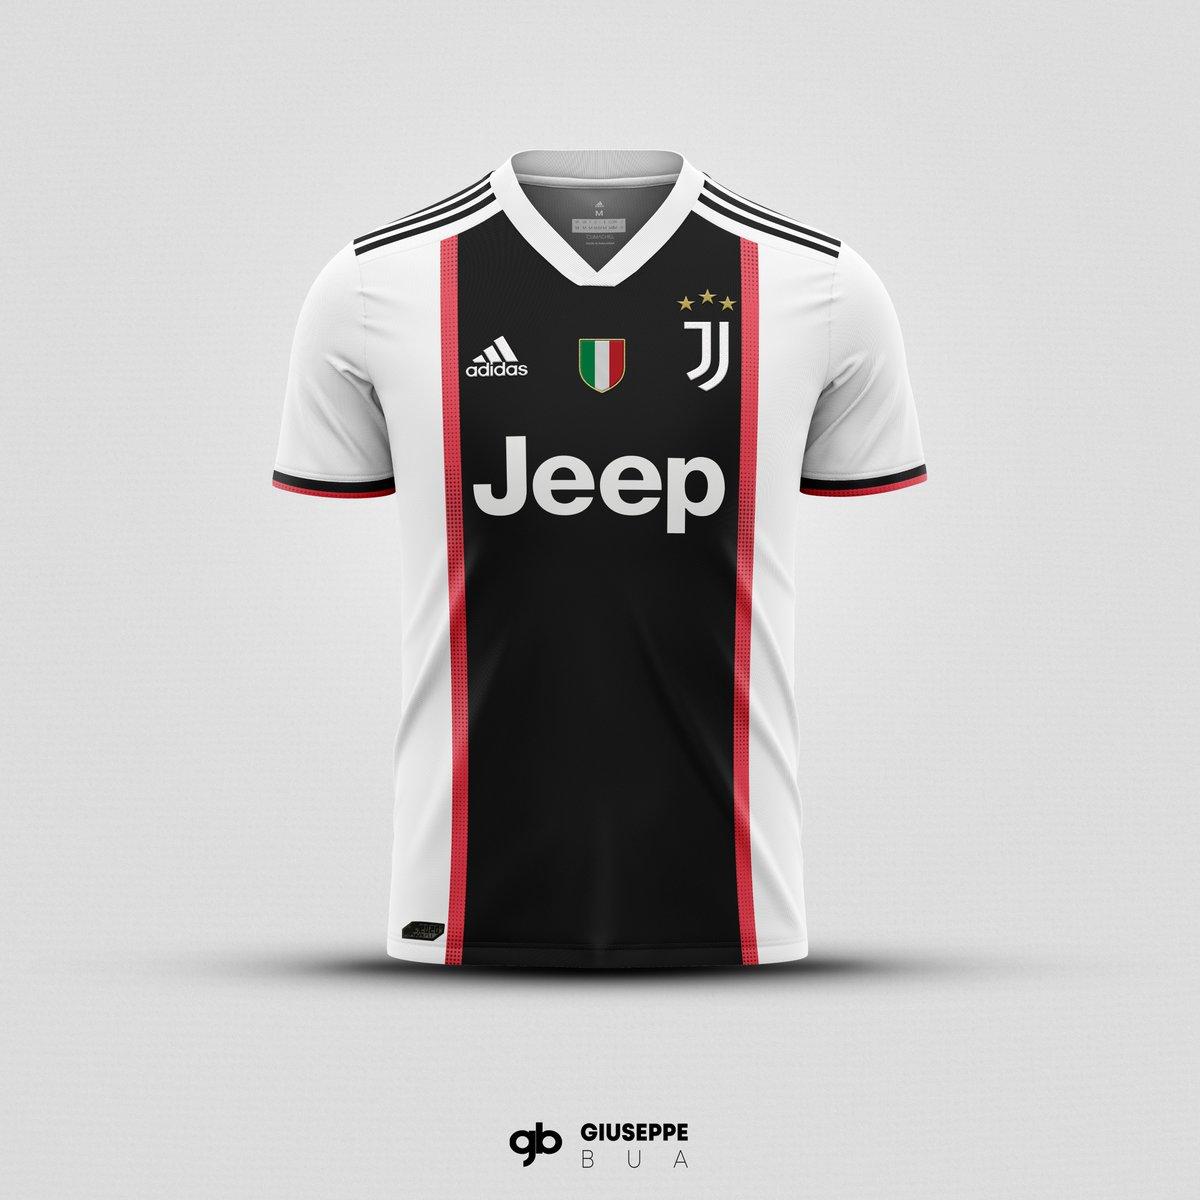 Concept #Juventus - #Adidas X #Ajax Styles   Cosa ne pensate?  #Juve #finoallafine #ConceptKit #conceptdesign #photoshop #photoshopeditingpic.twitter.com/lehMPgZfdE